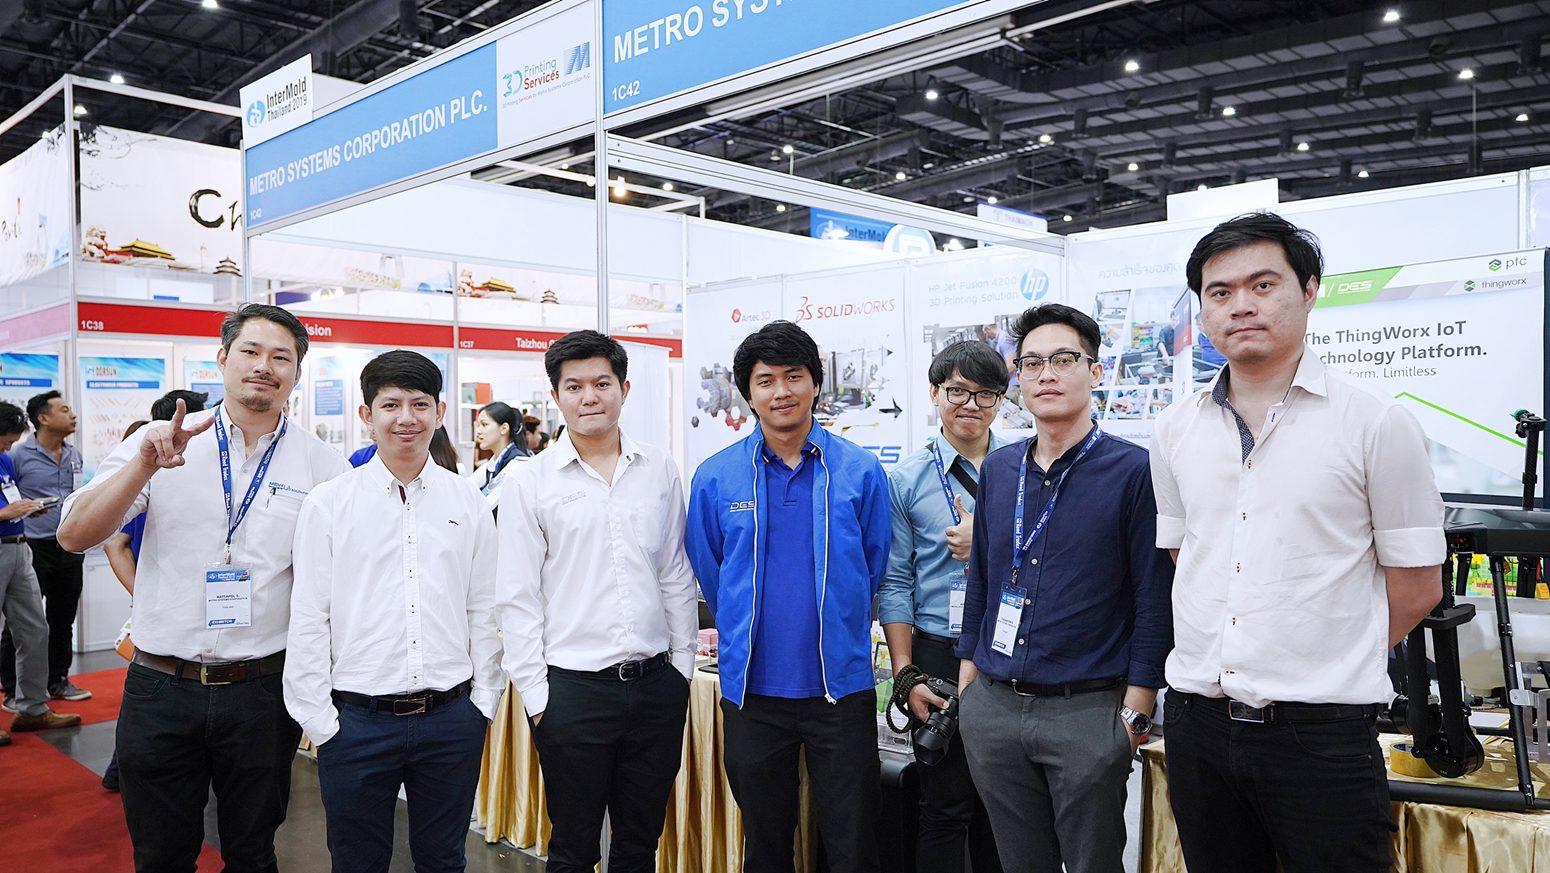 Metro SOLIDWORKS ร่วมแสดง Solution ภายในงาน Manufacturing Expo 2019